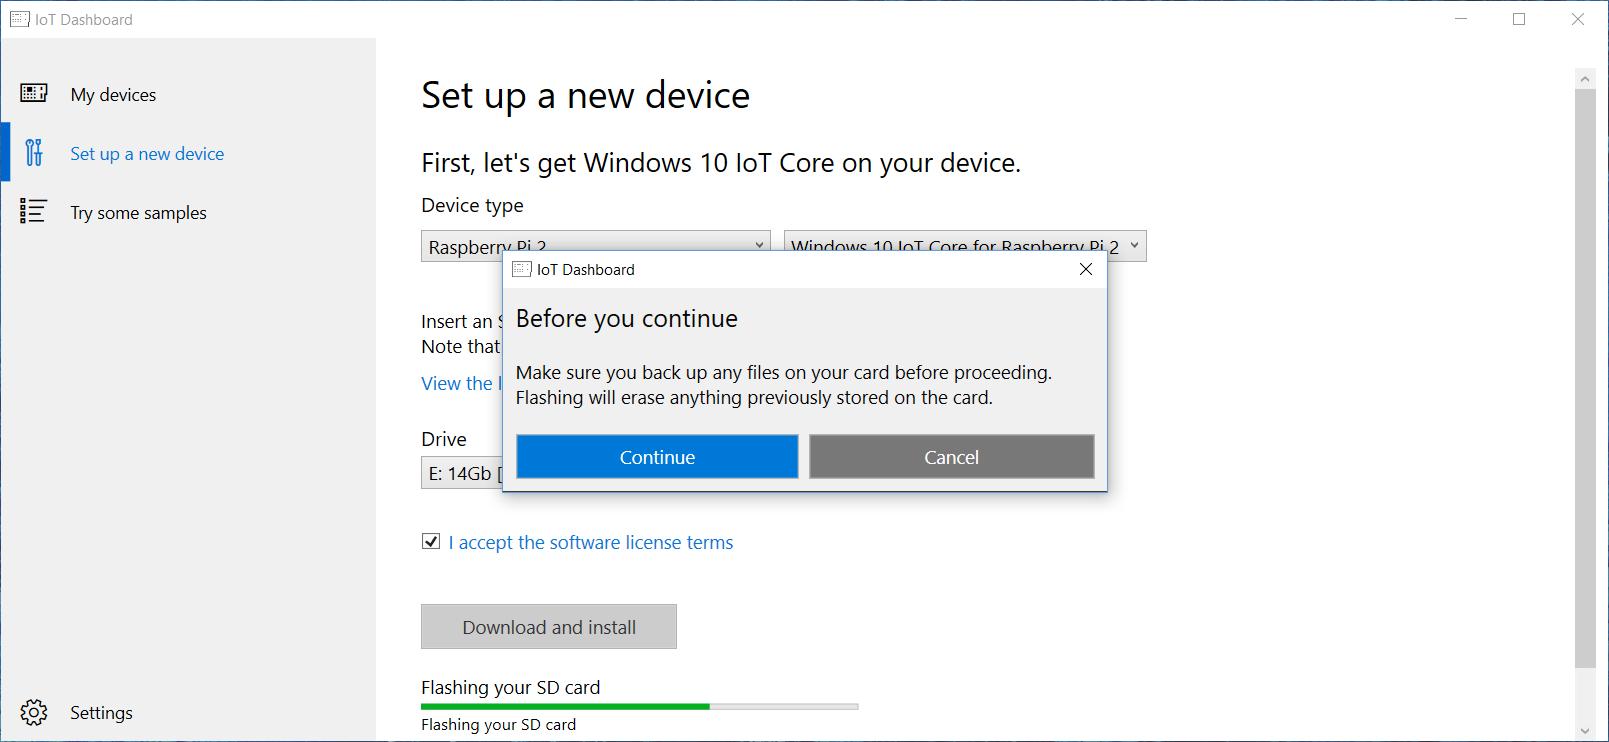 Raspberry pi 2 windows 10 download